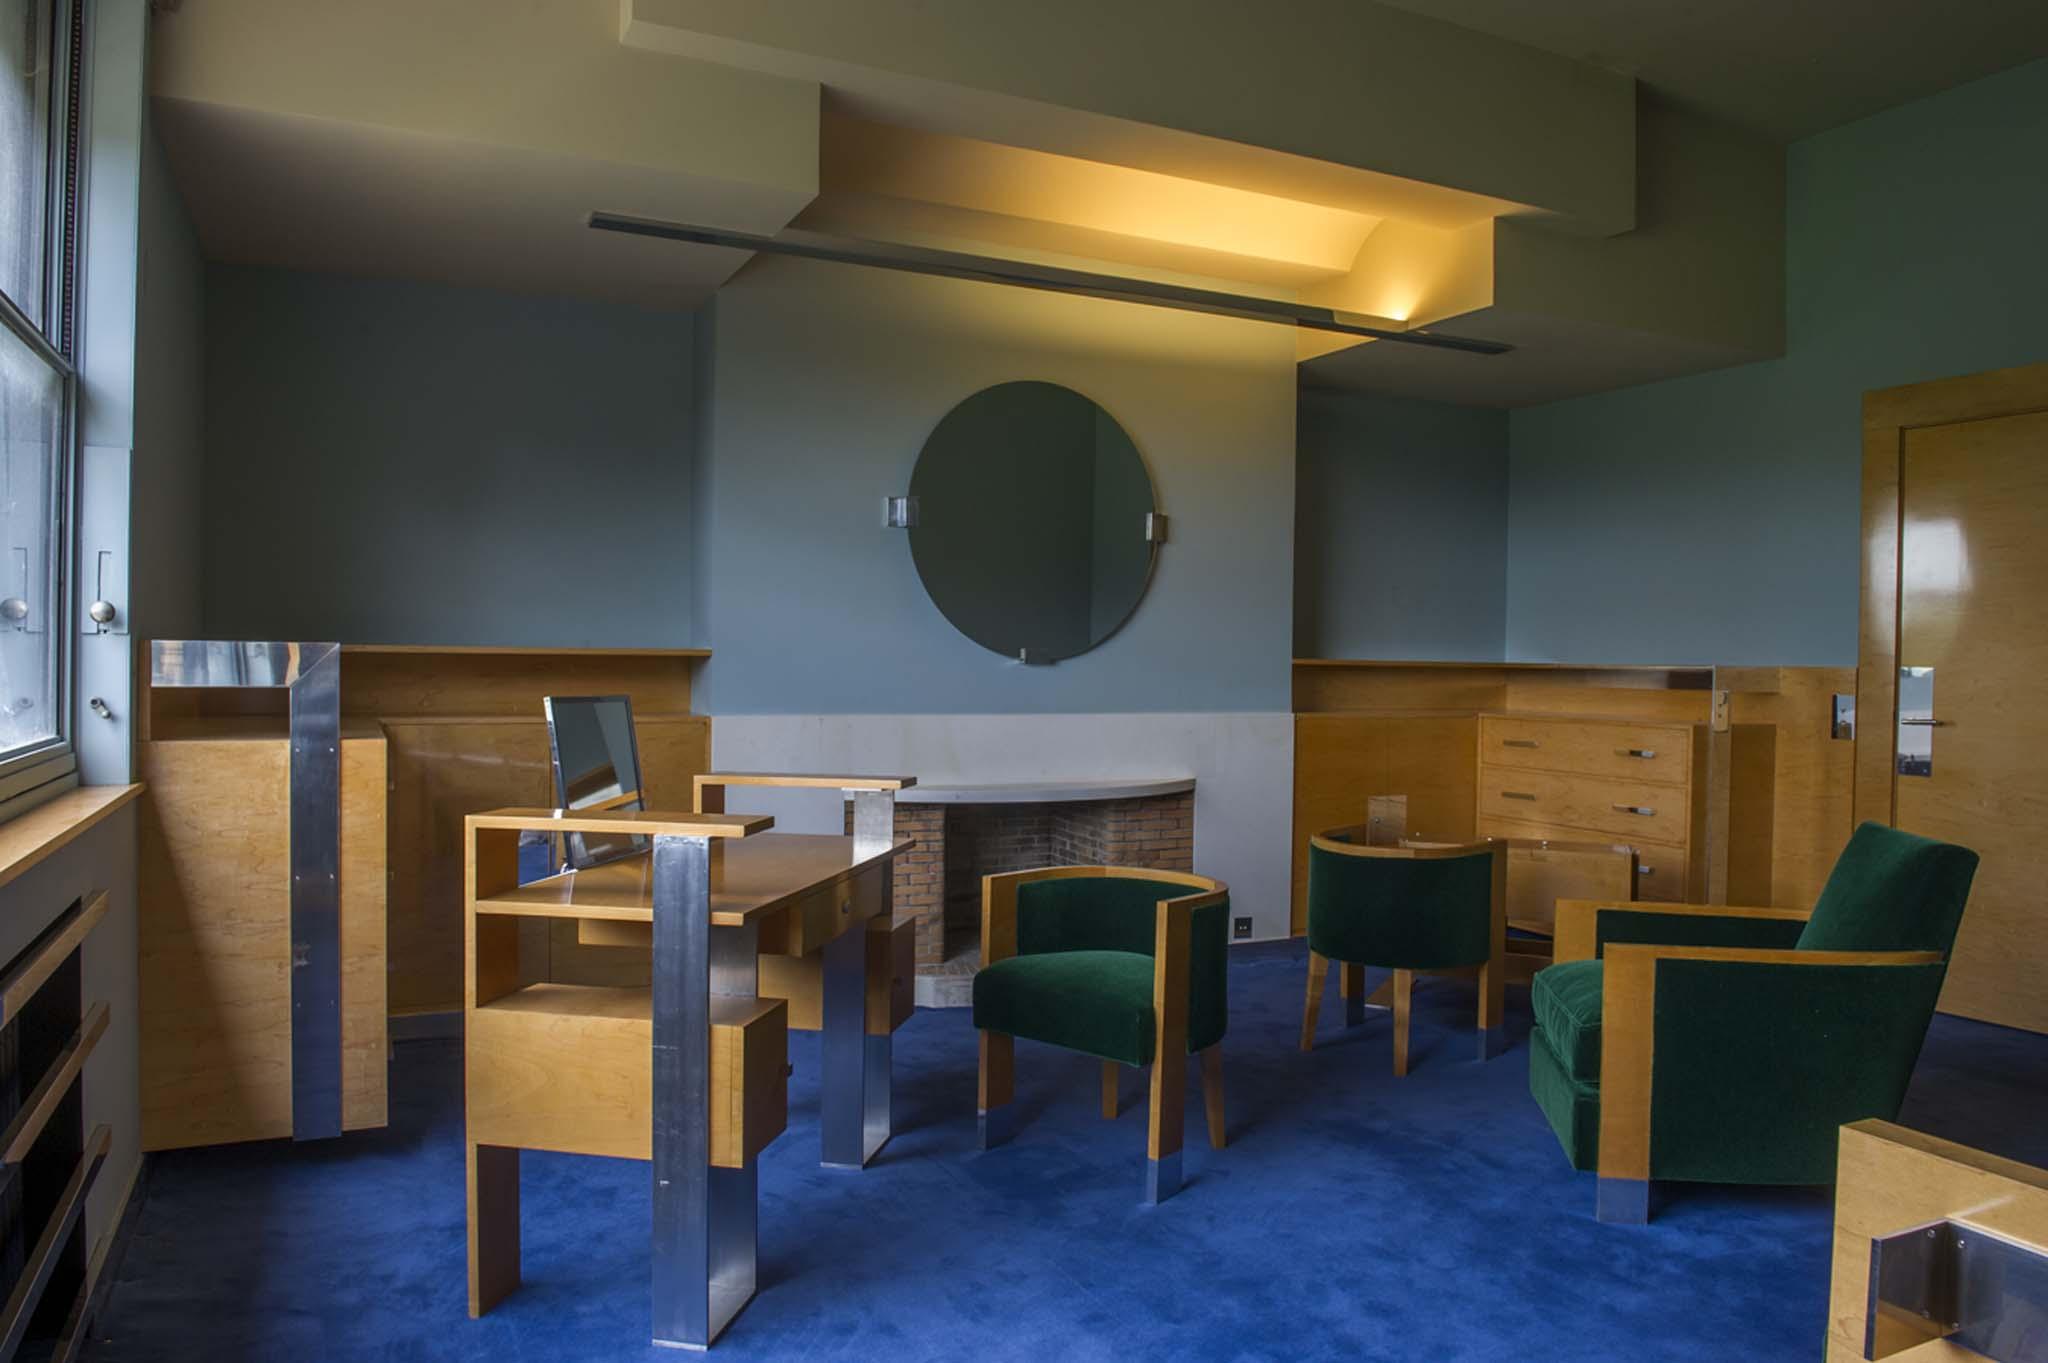 villa cavrois boudoir de madame cavrois. Black Bedroom Furniture Sets. Home Design Ideas